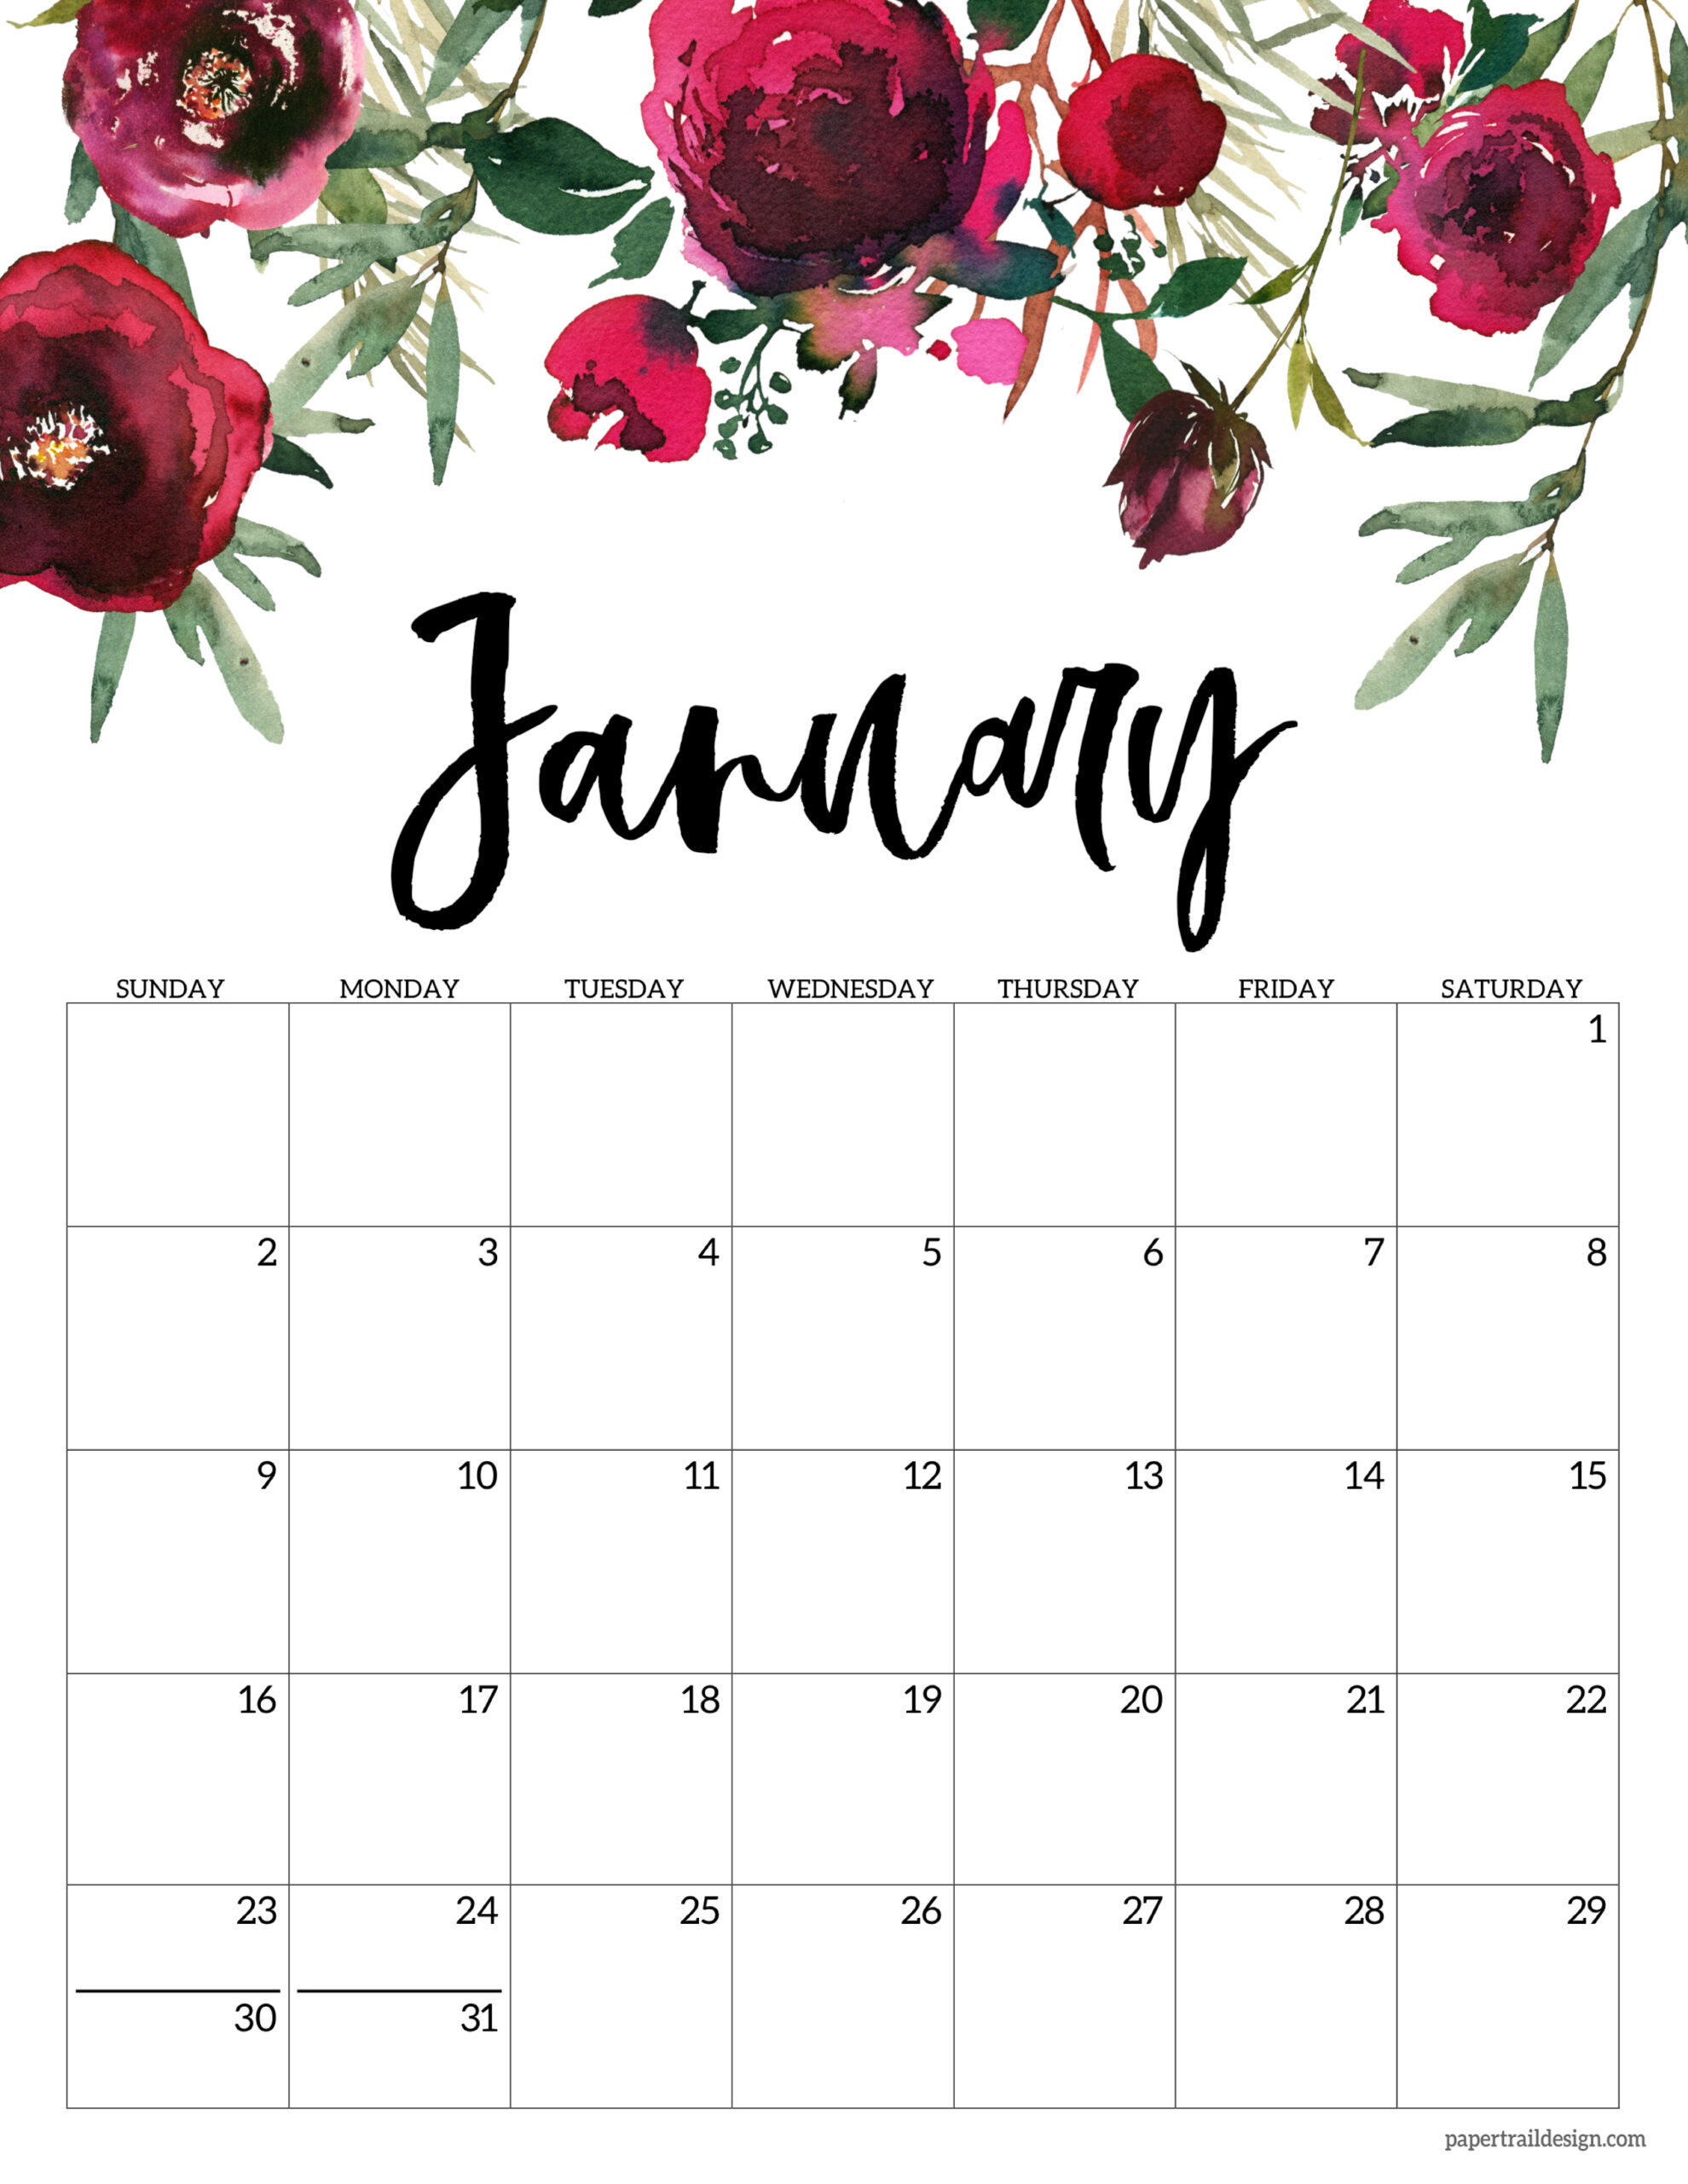 free 2022 excel calendars templates. Free 2022 Calendar Printable - Floral   Paper Trail Design